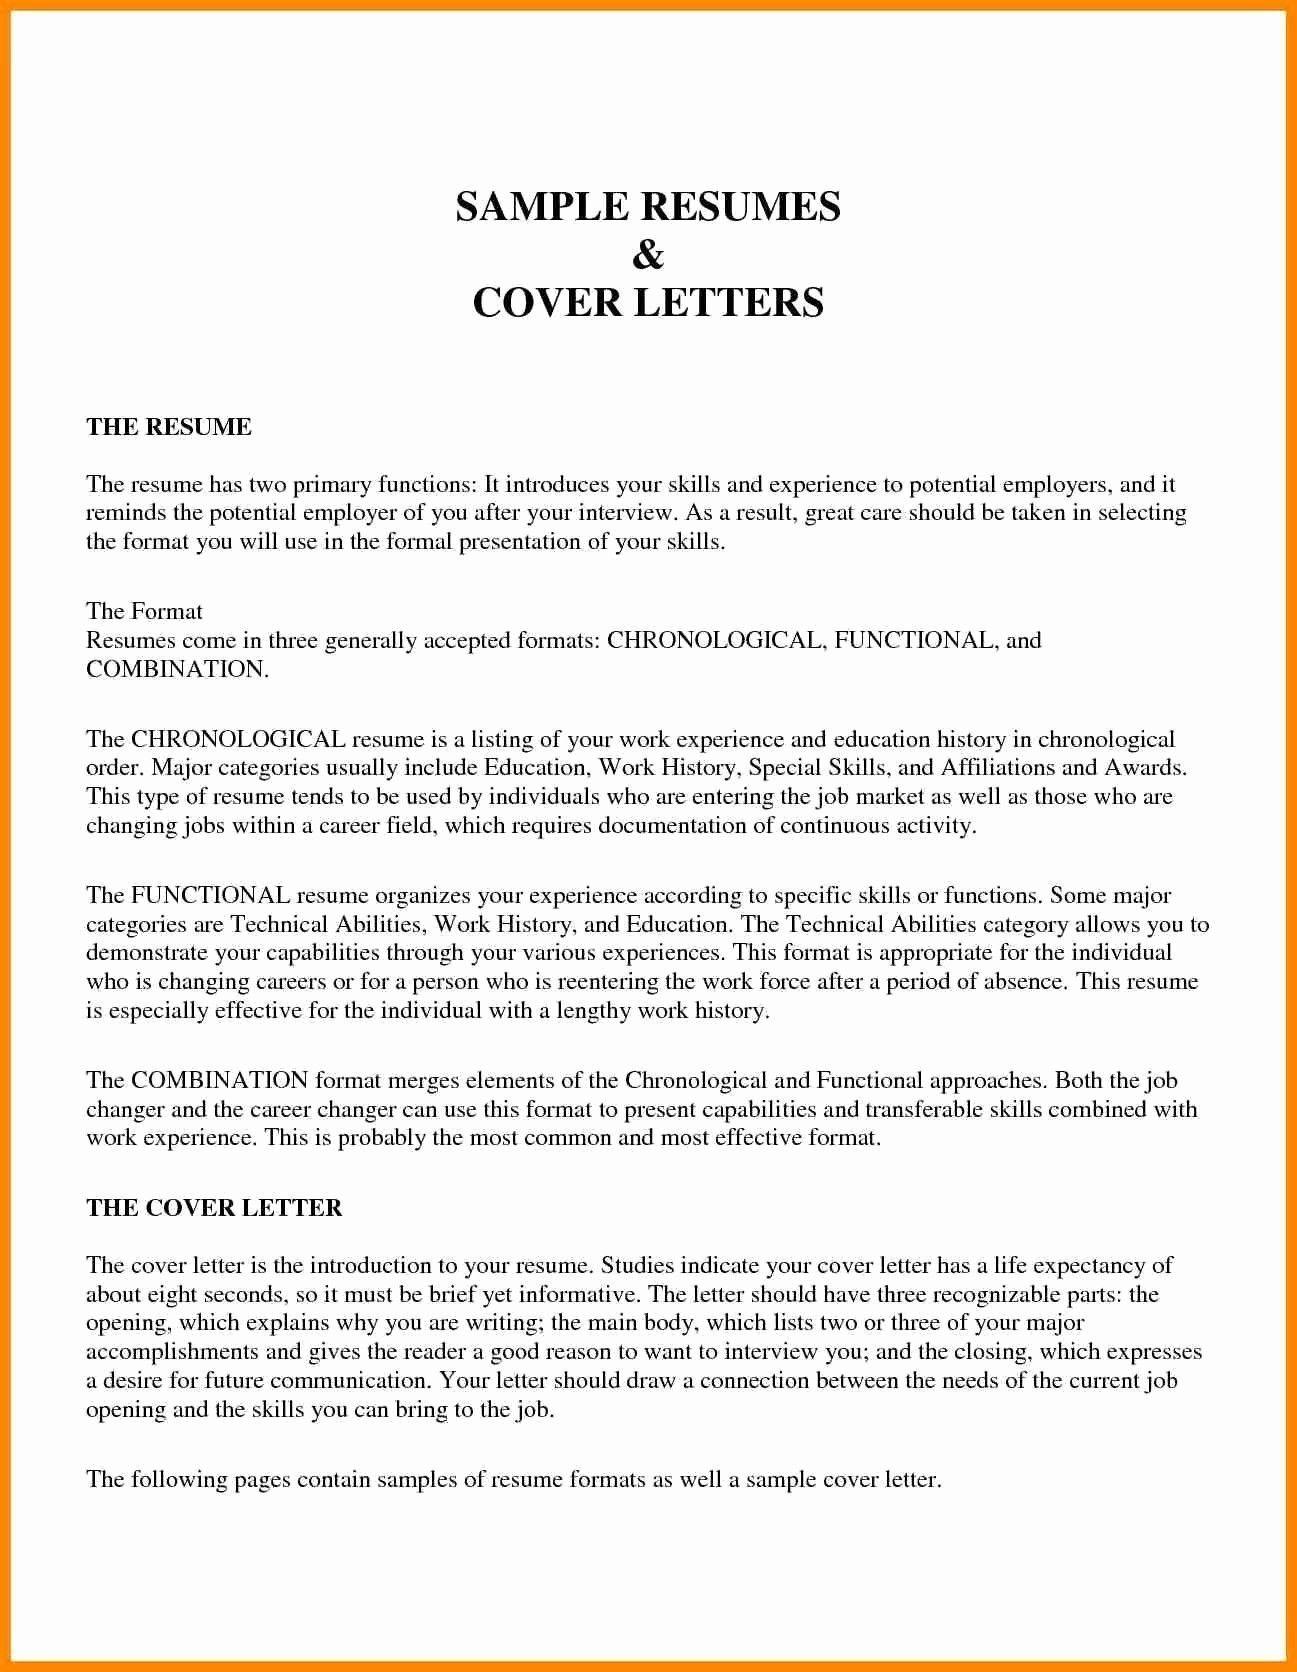 Download New Cover Letter For Job Application Australia